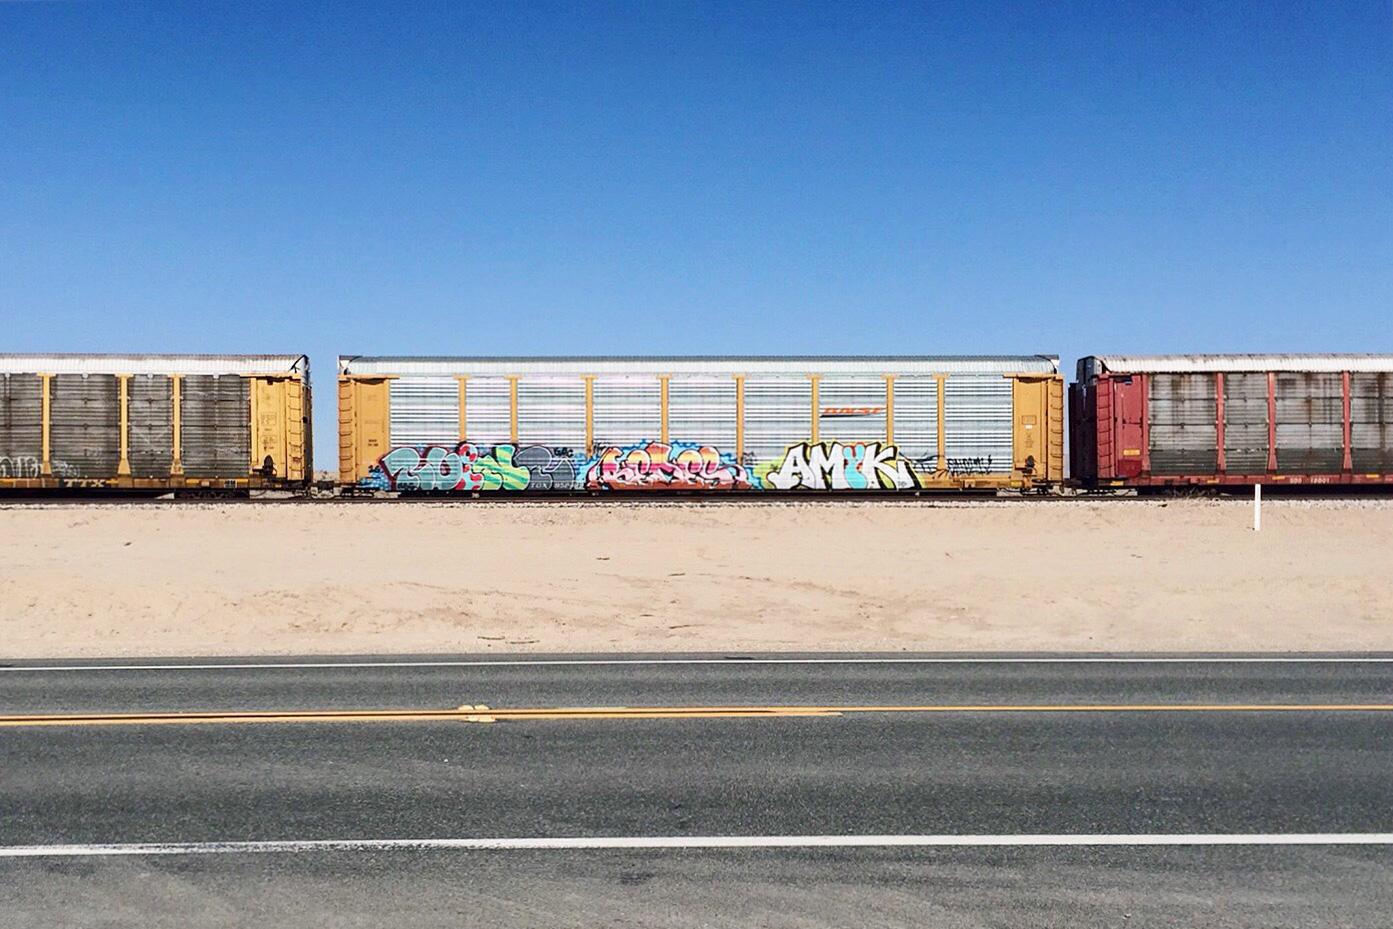 Chasing Trains 2